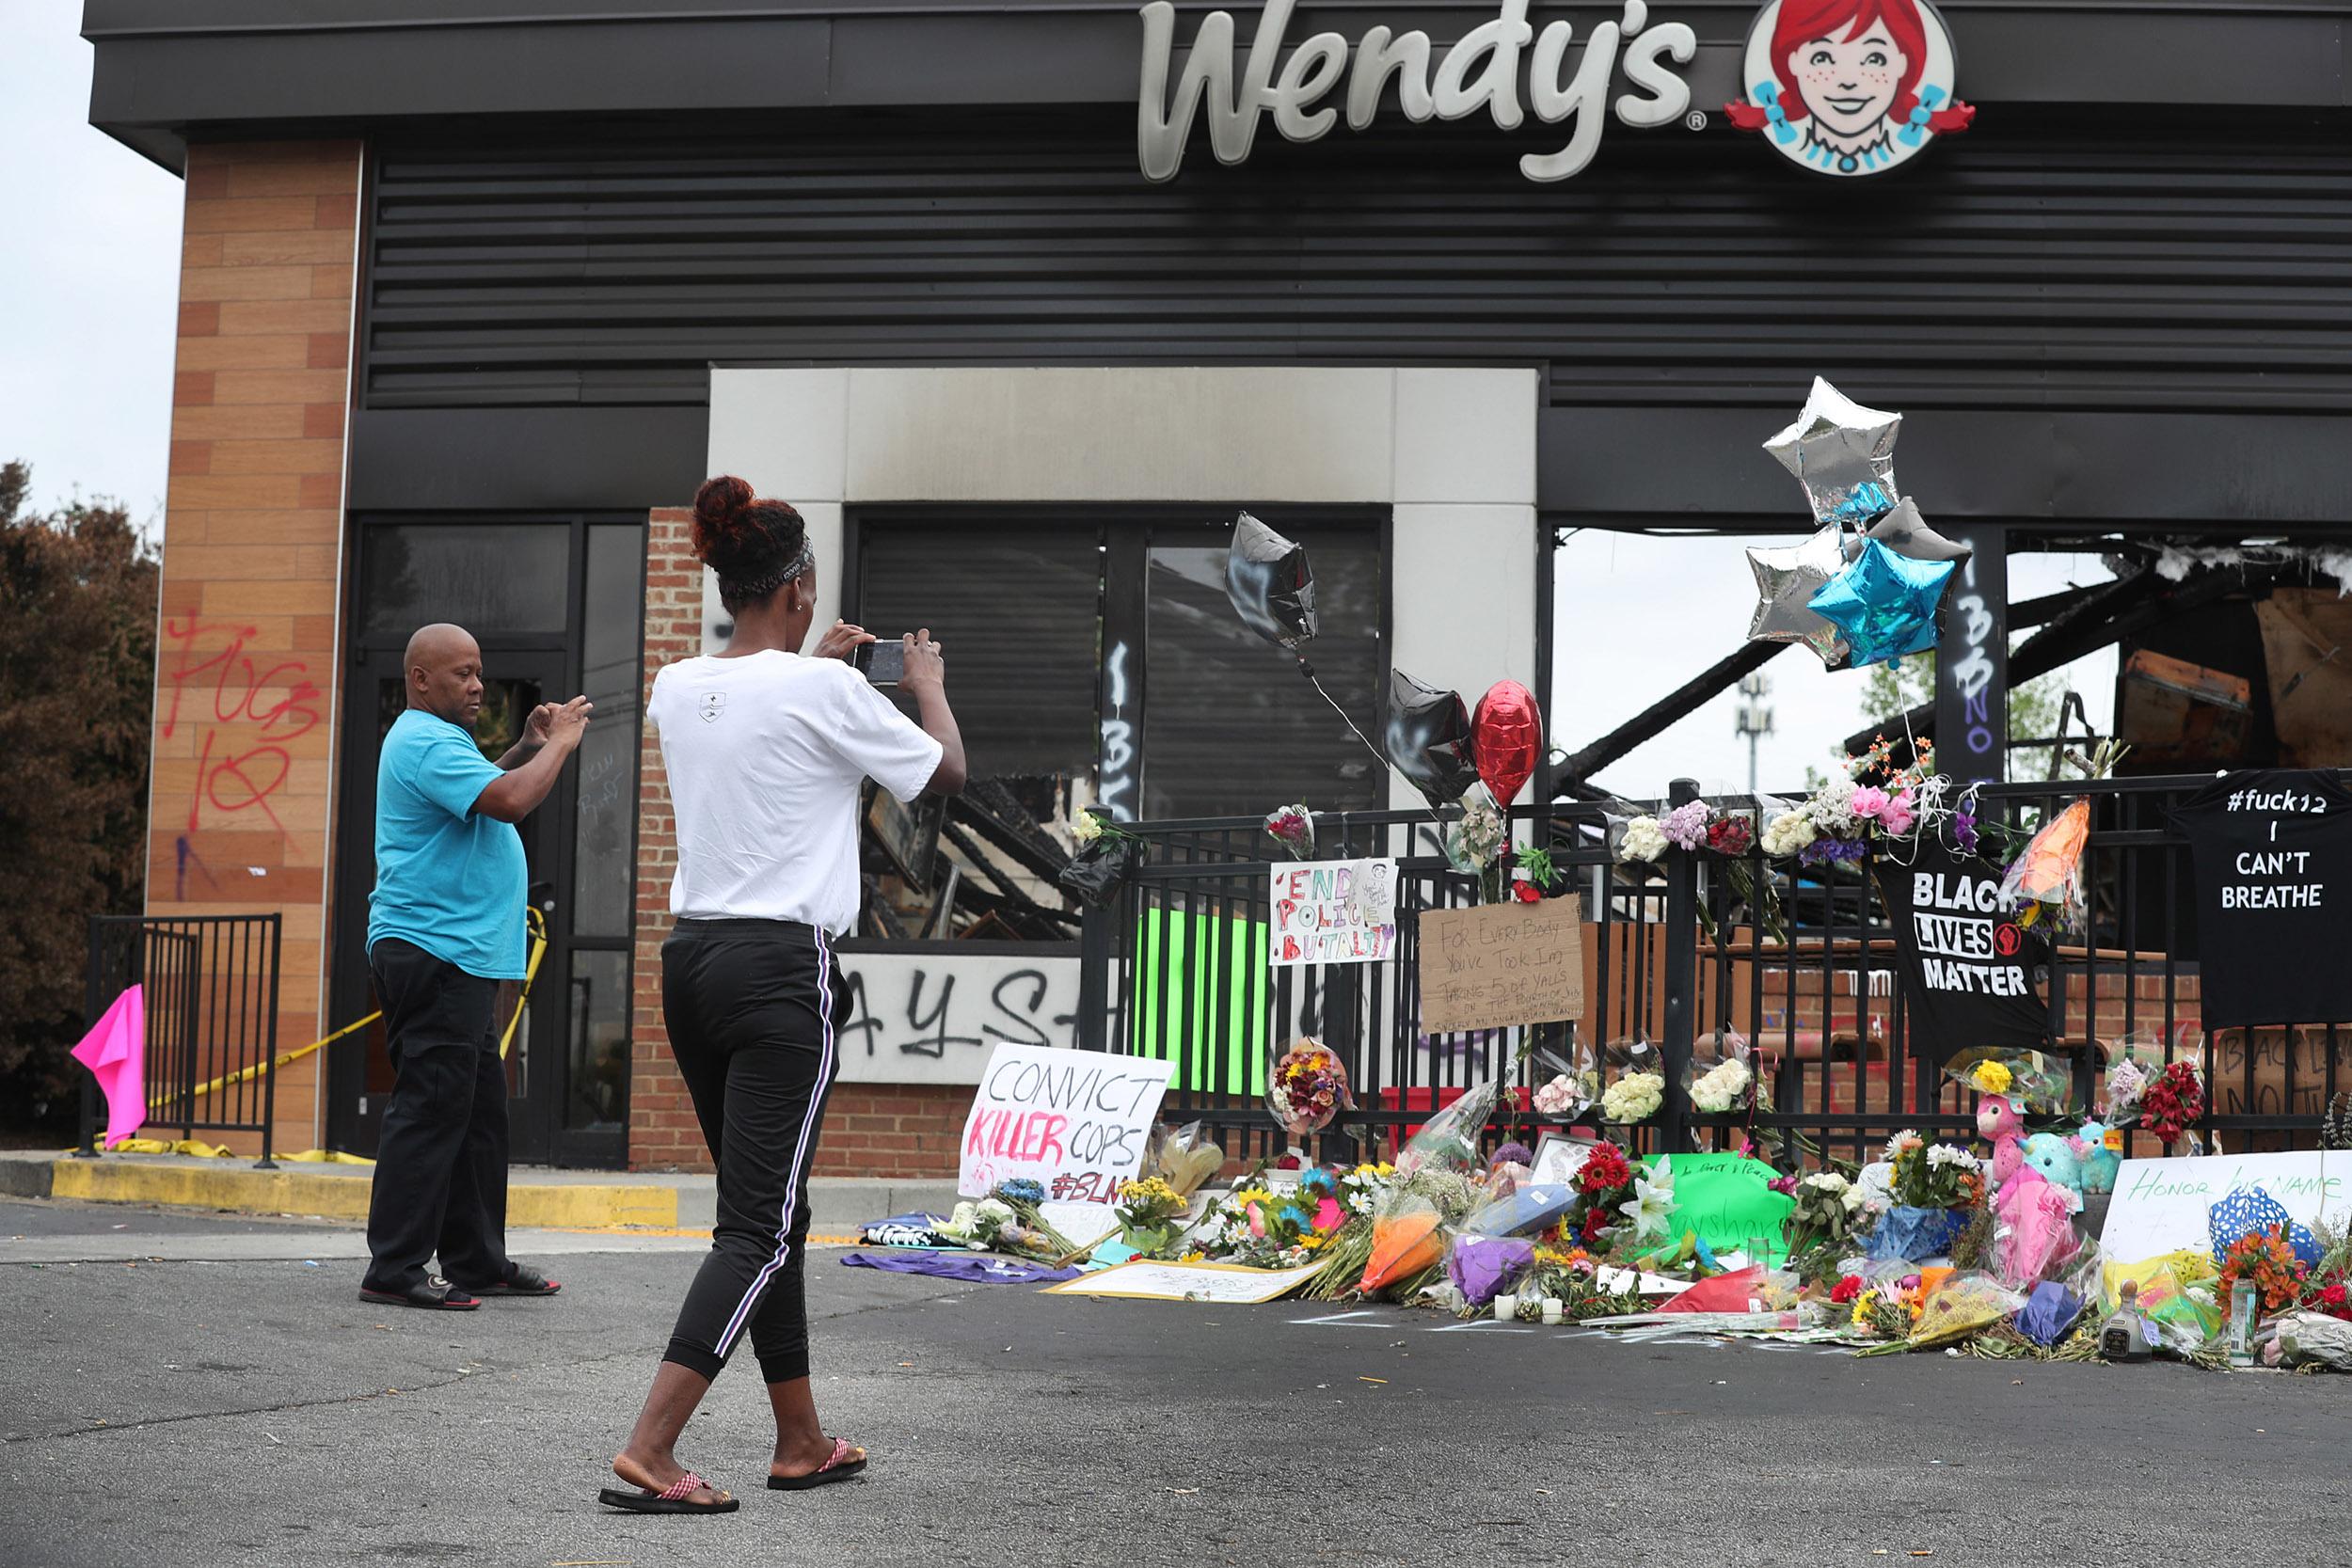 8-year-old girl fatally shot near Rayshard Brooks' memorial site